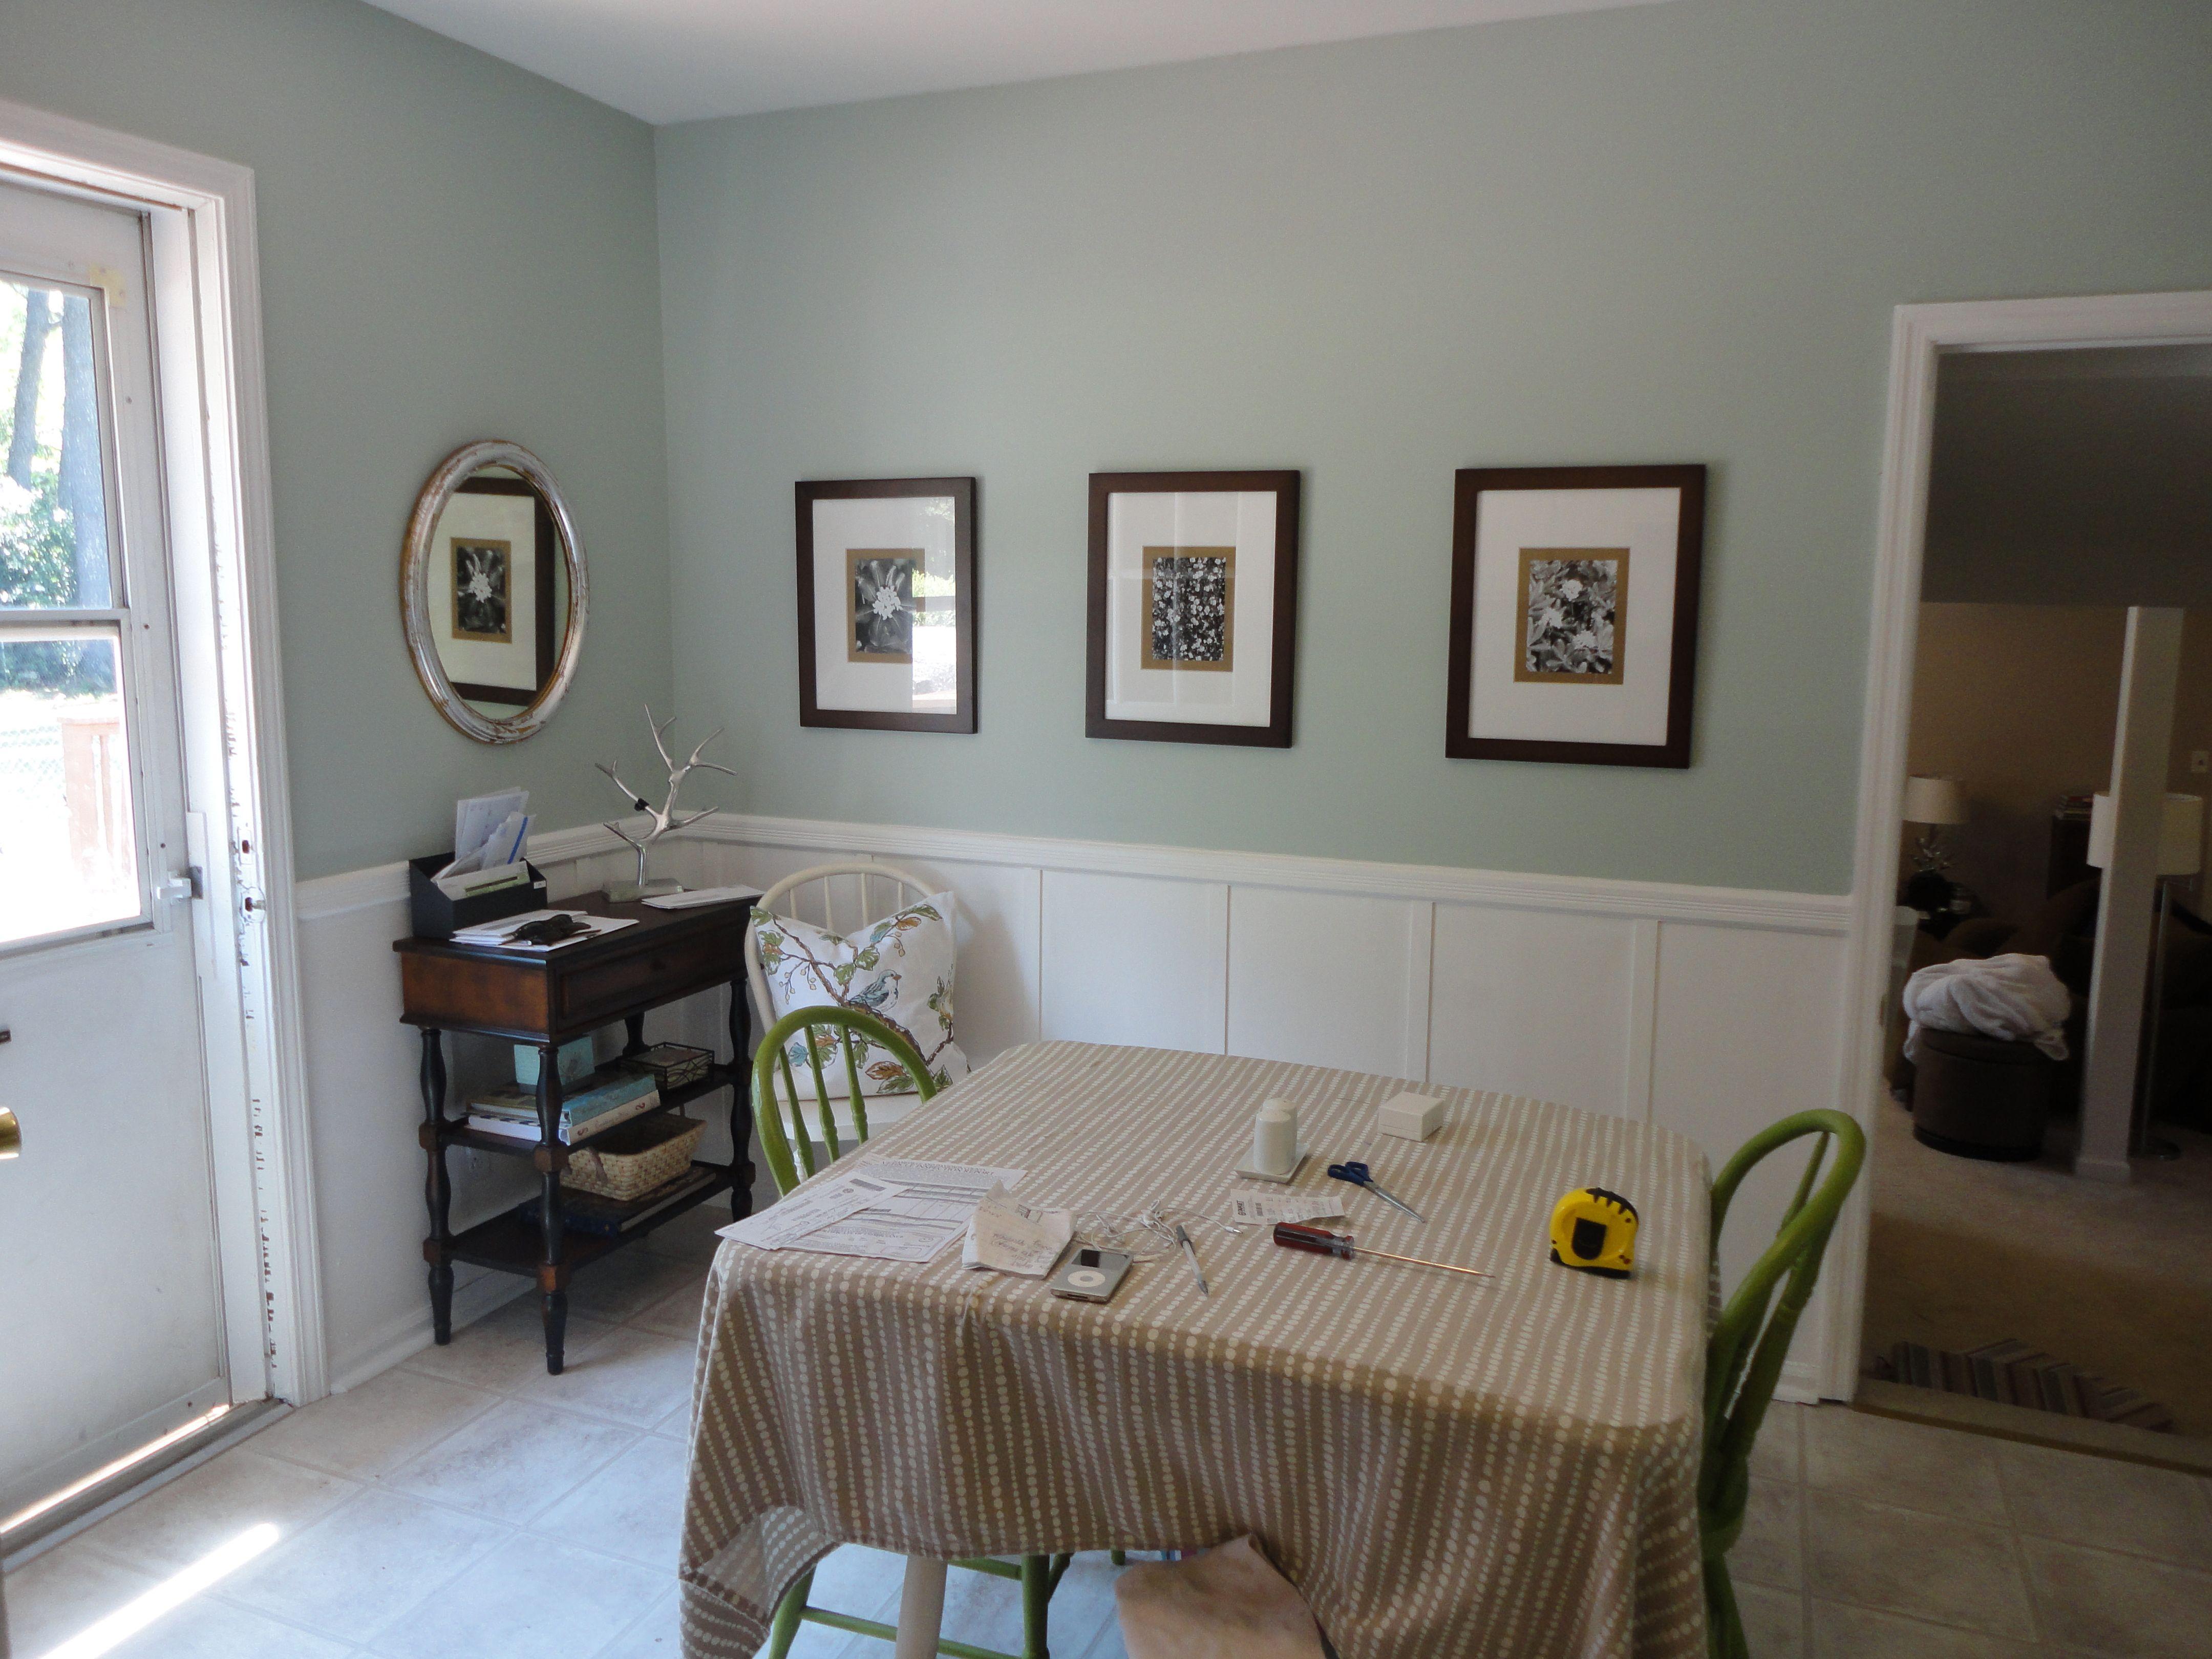 4 320 3 240 Pixels Sherwin Williams Rainwashed Paint Pinterest Blue Rooms